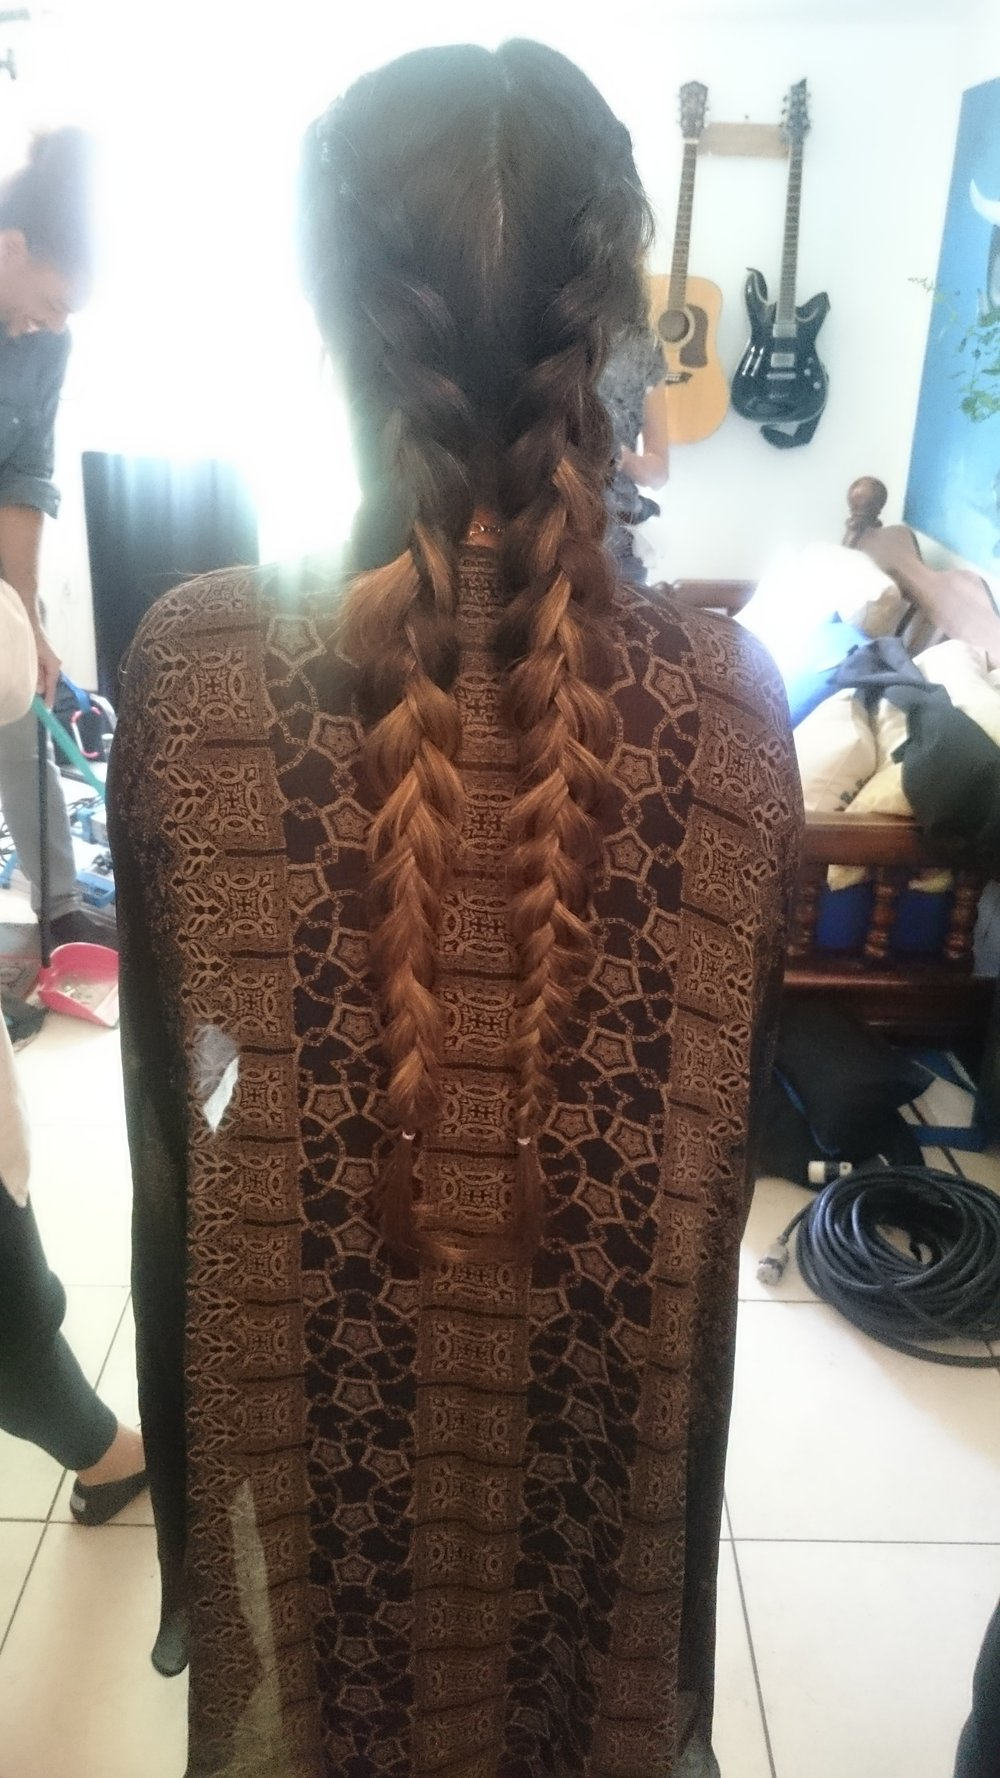 John-freida-hair-artist.JPG